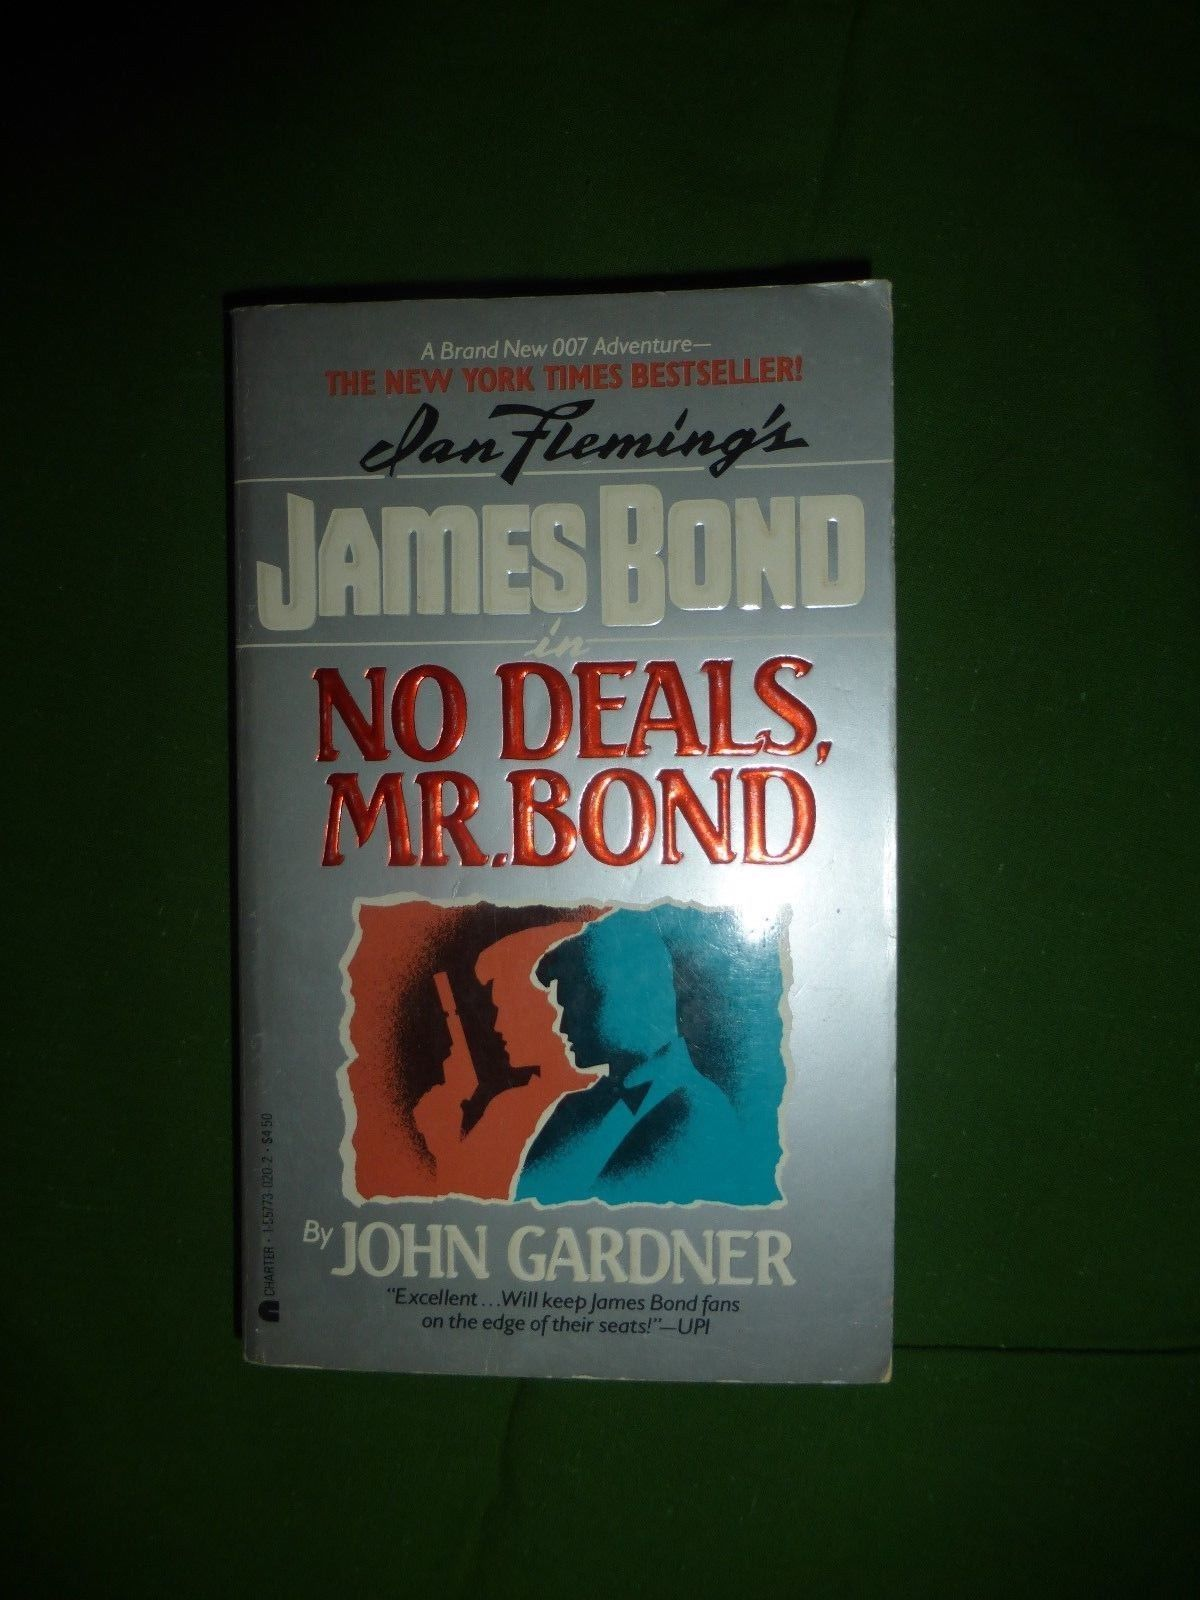 Ian Fleming James Bond No Deals Mr Bond John Gardner English